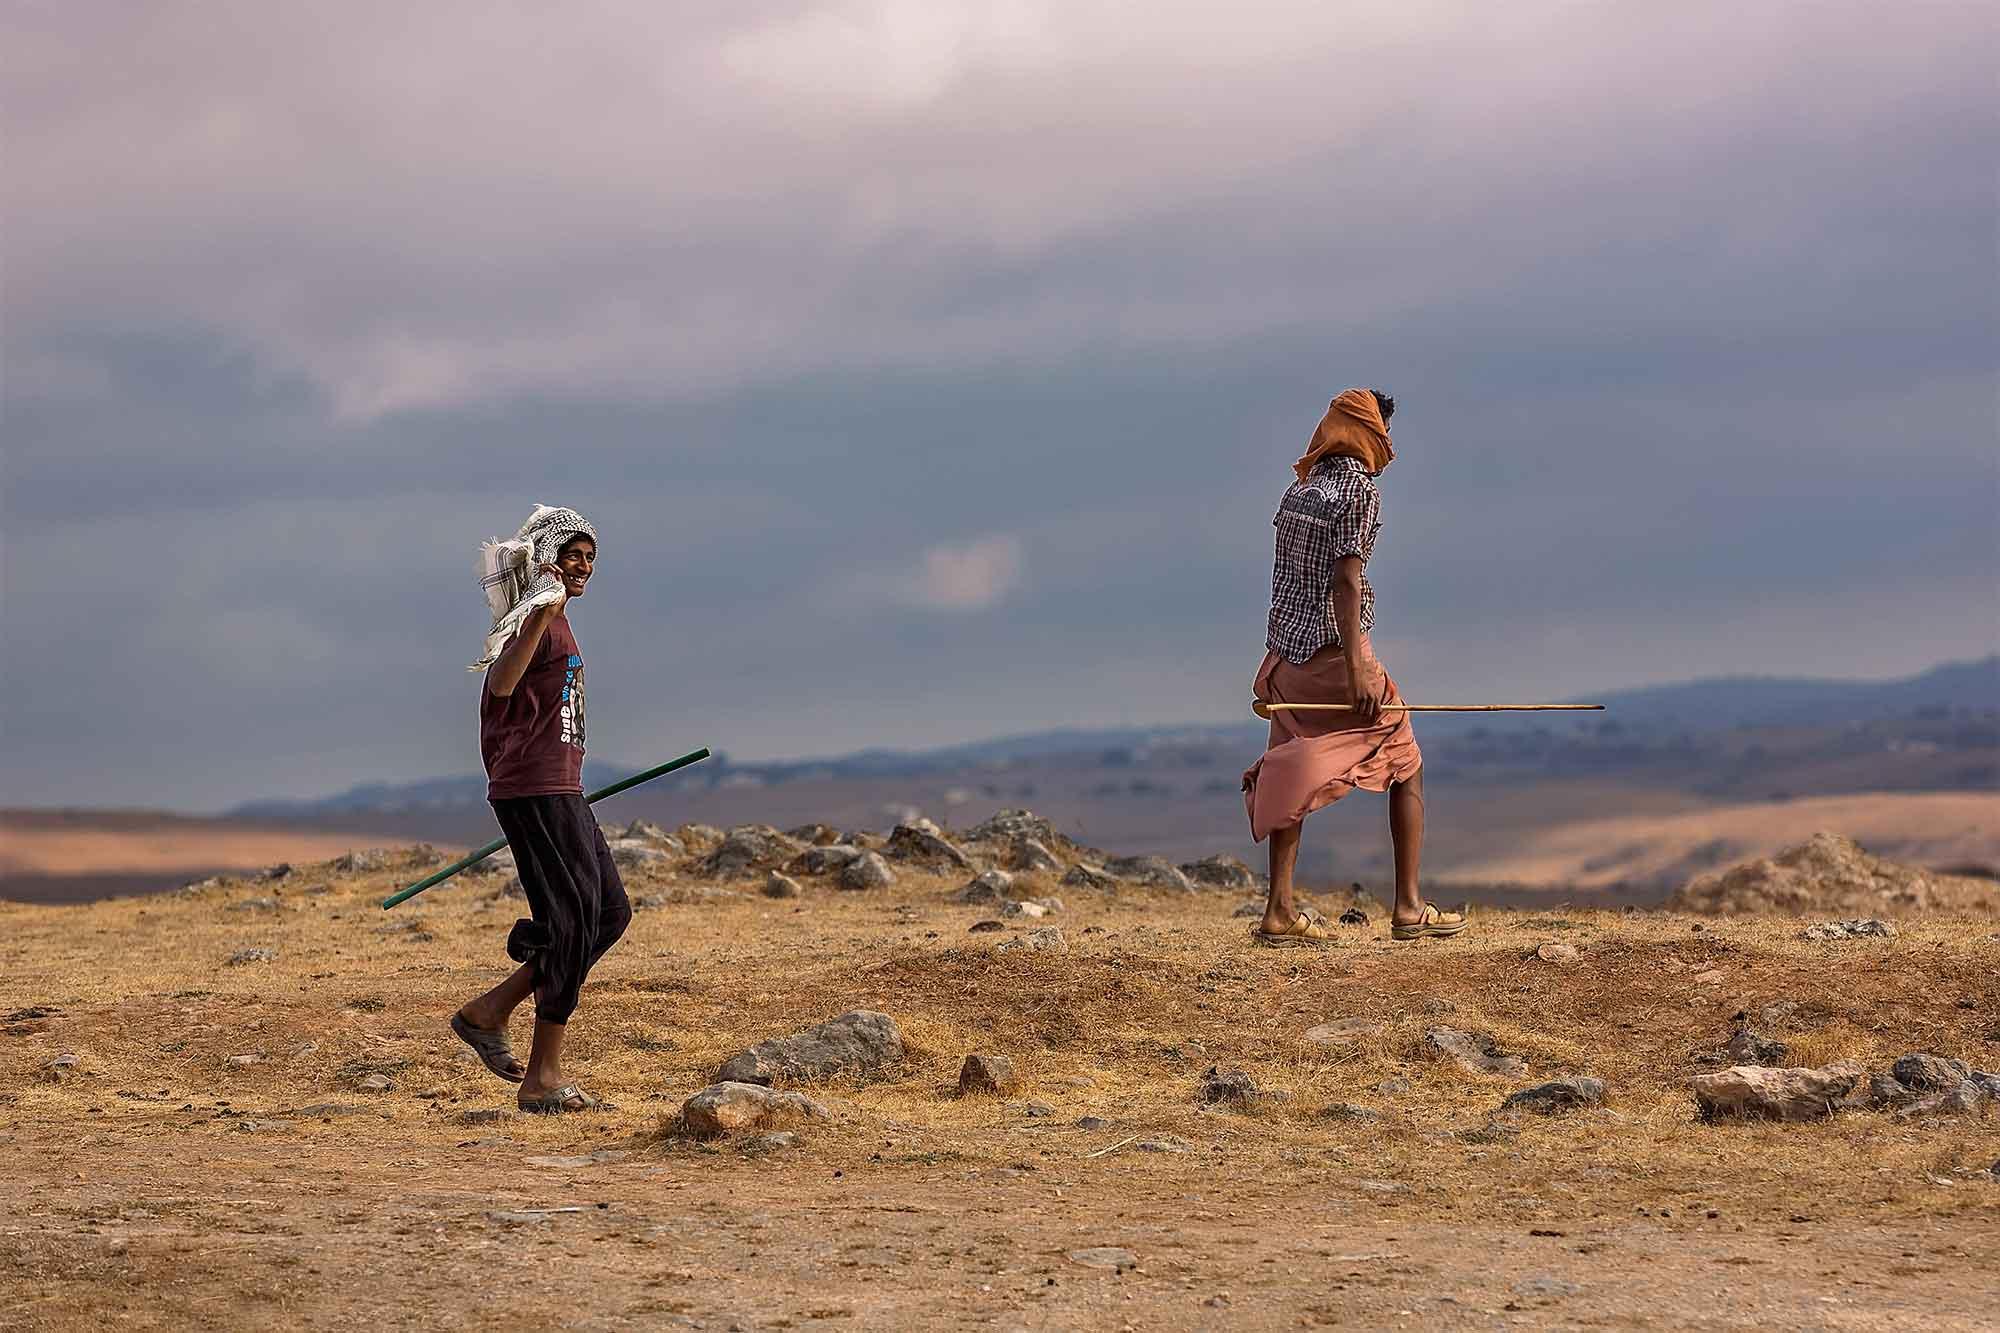 camel-herders-near-thumrait-oman